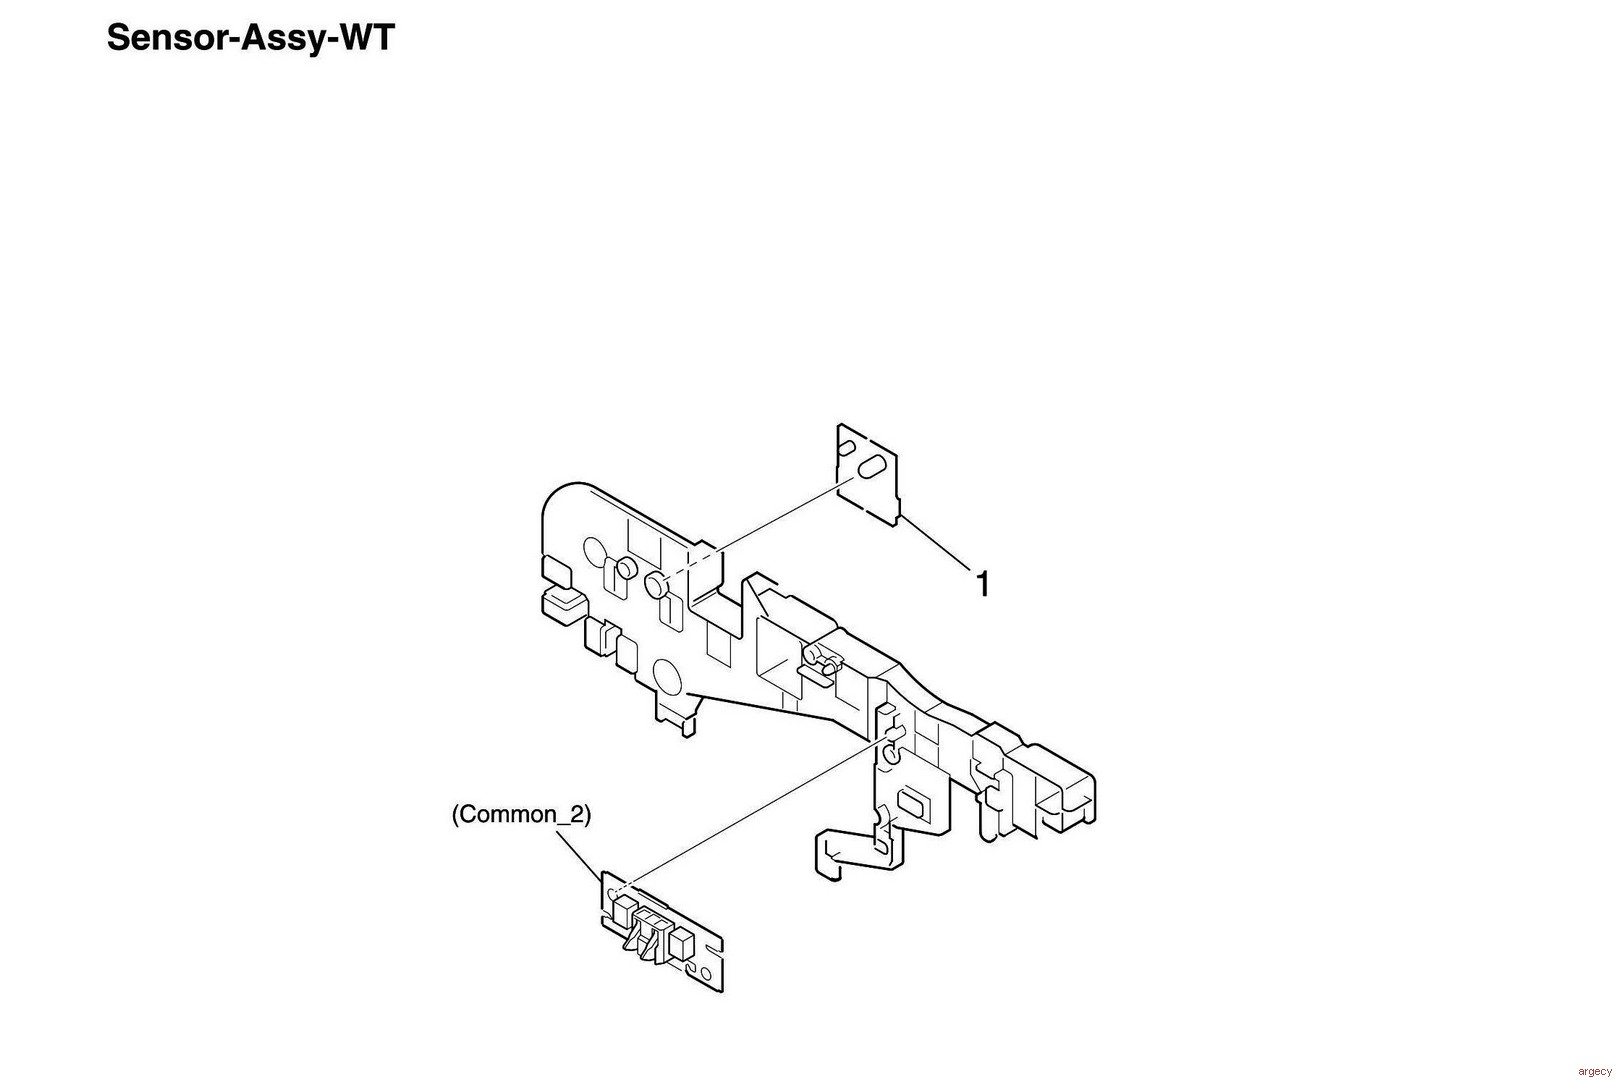 http://www.argecy.com/images/C911_C931_C941_Parts-31_cr.jpg